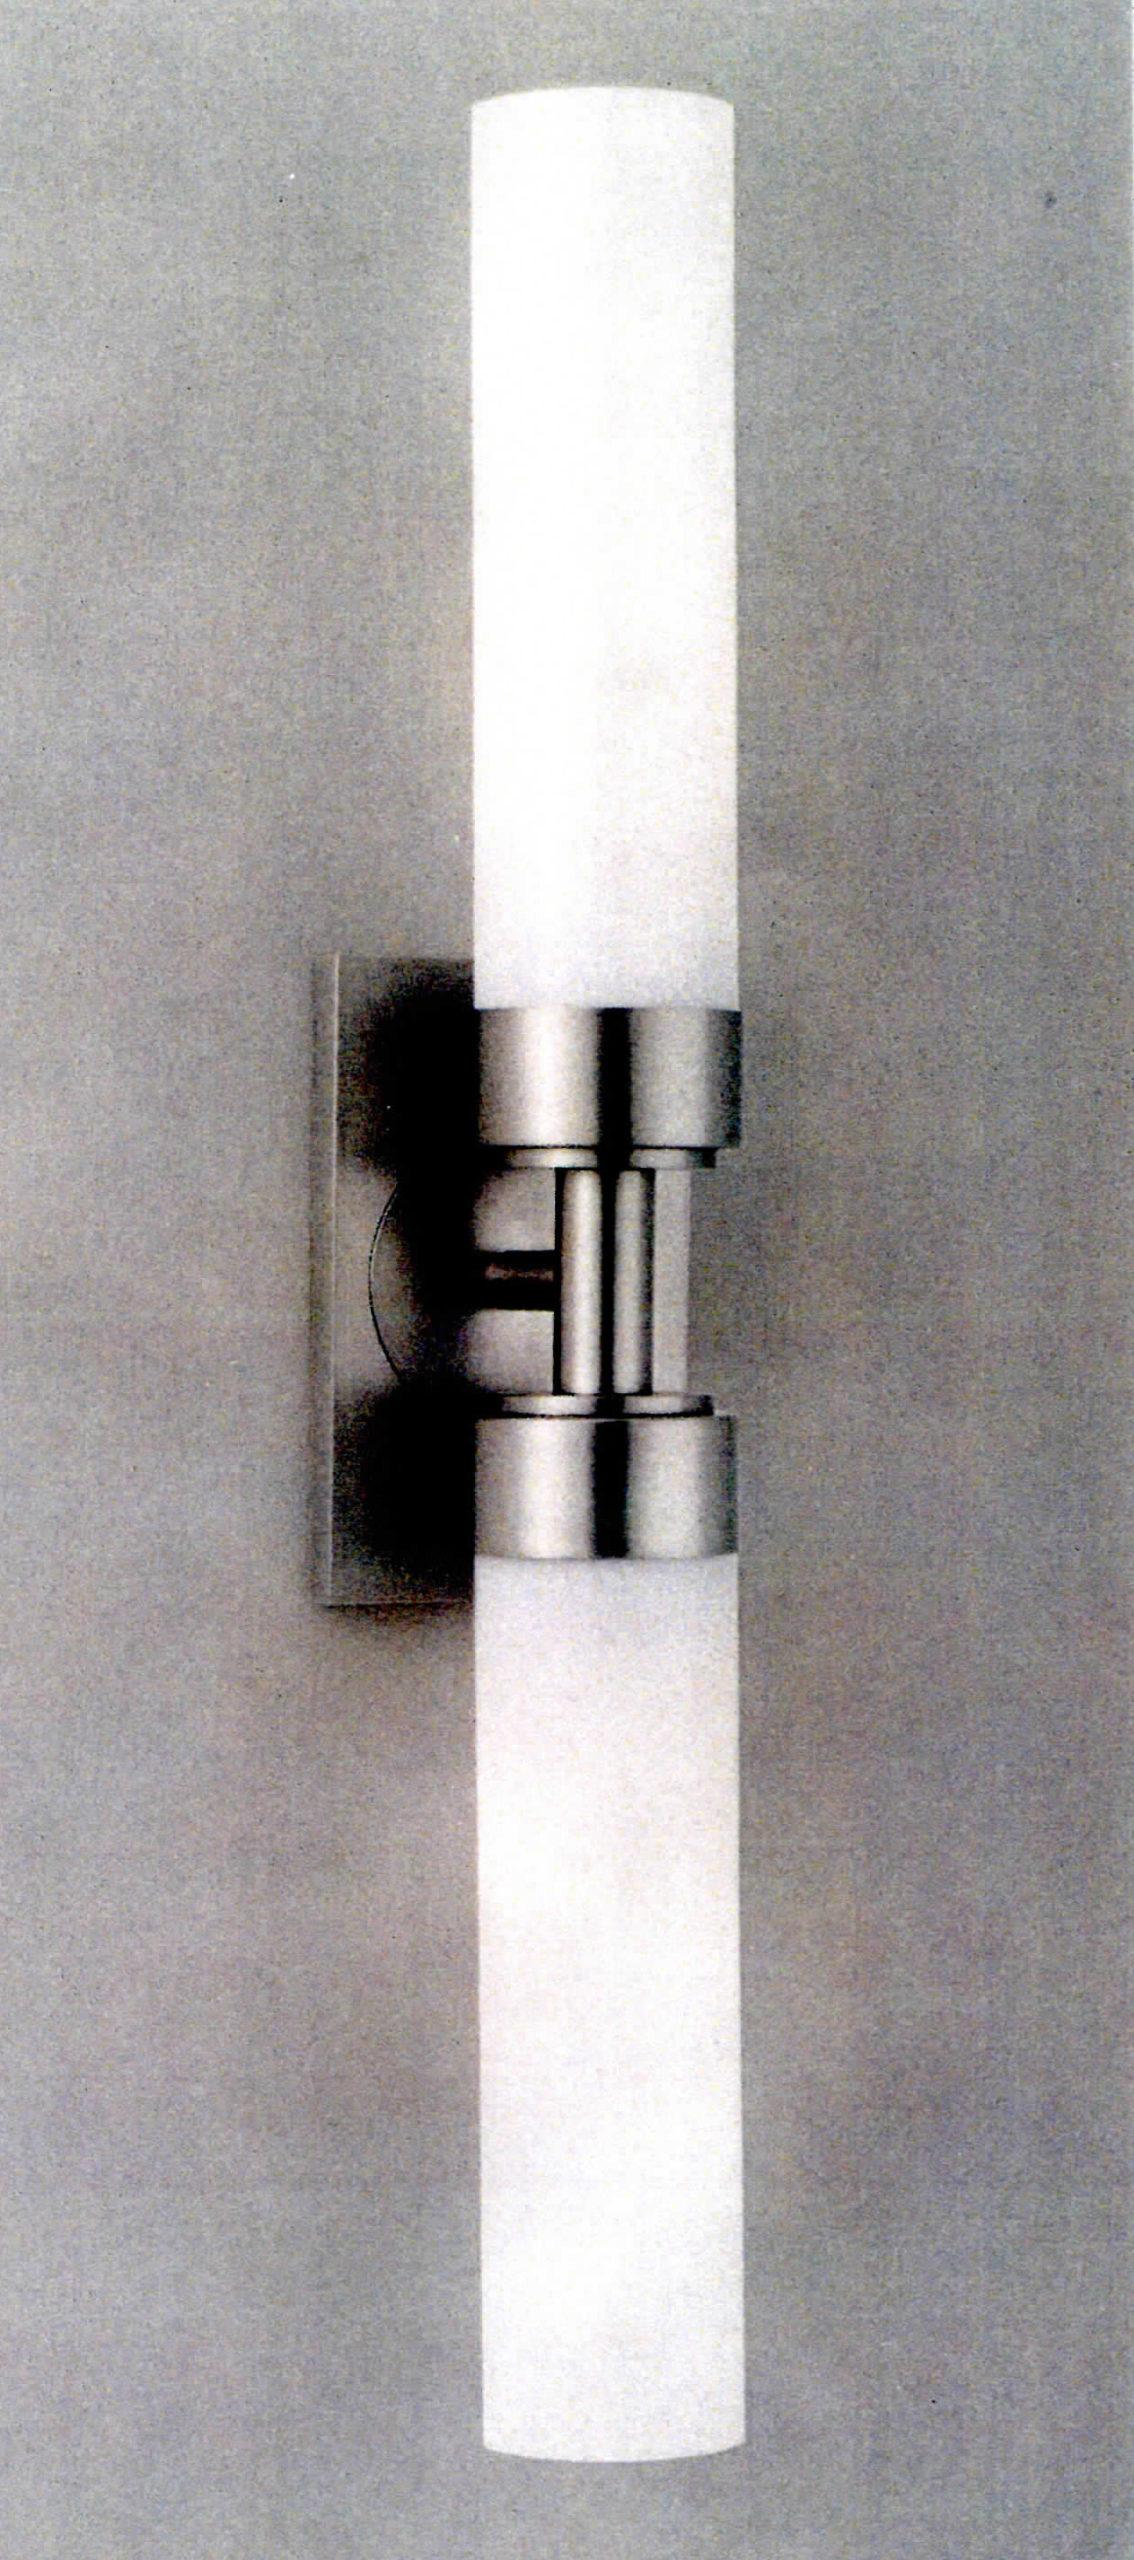 Calger Lighting Image 18